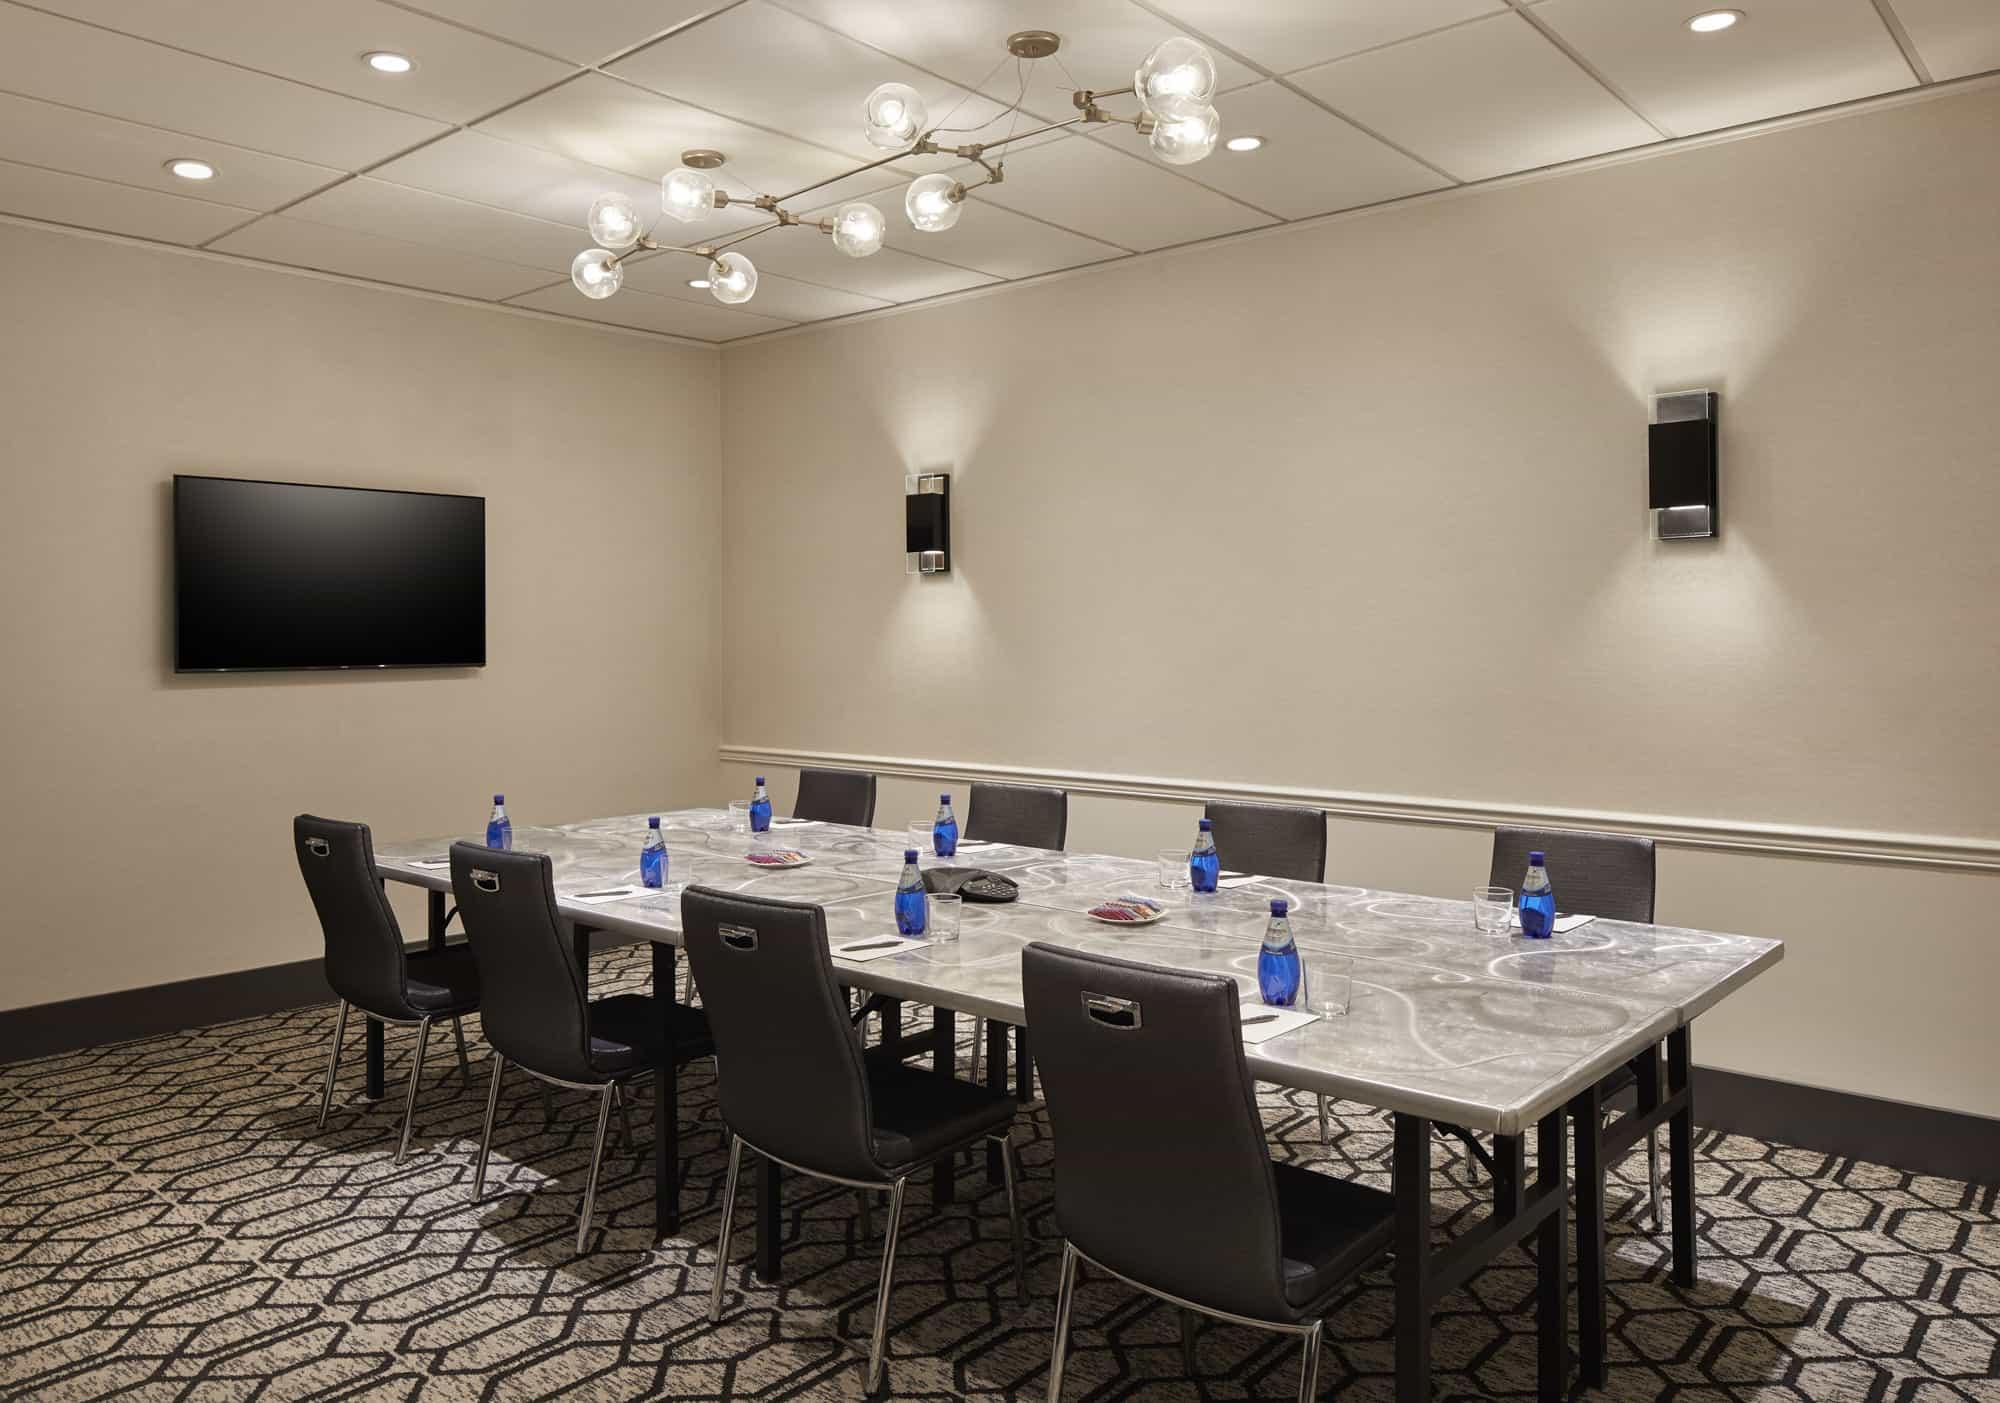 The Da Vinci Room set up for a meeting.